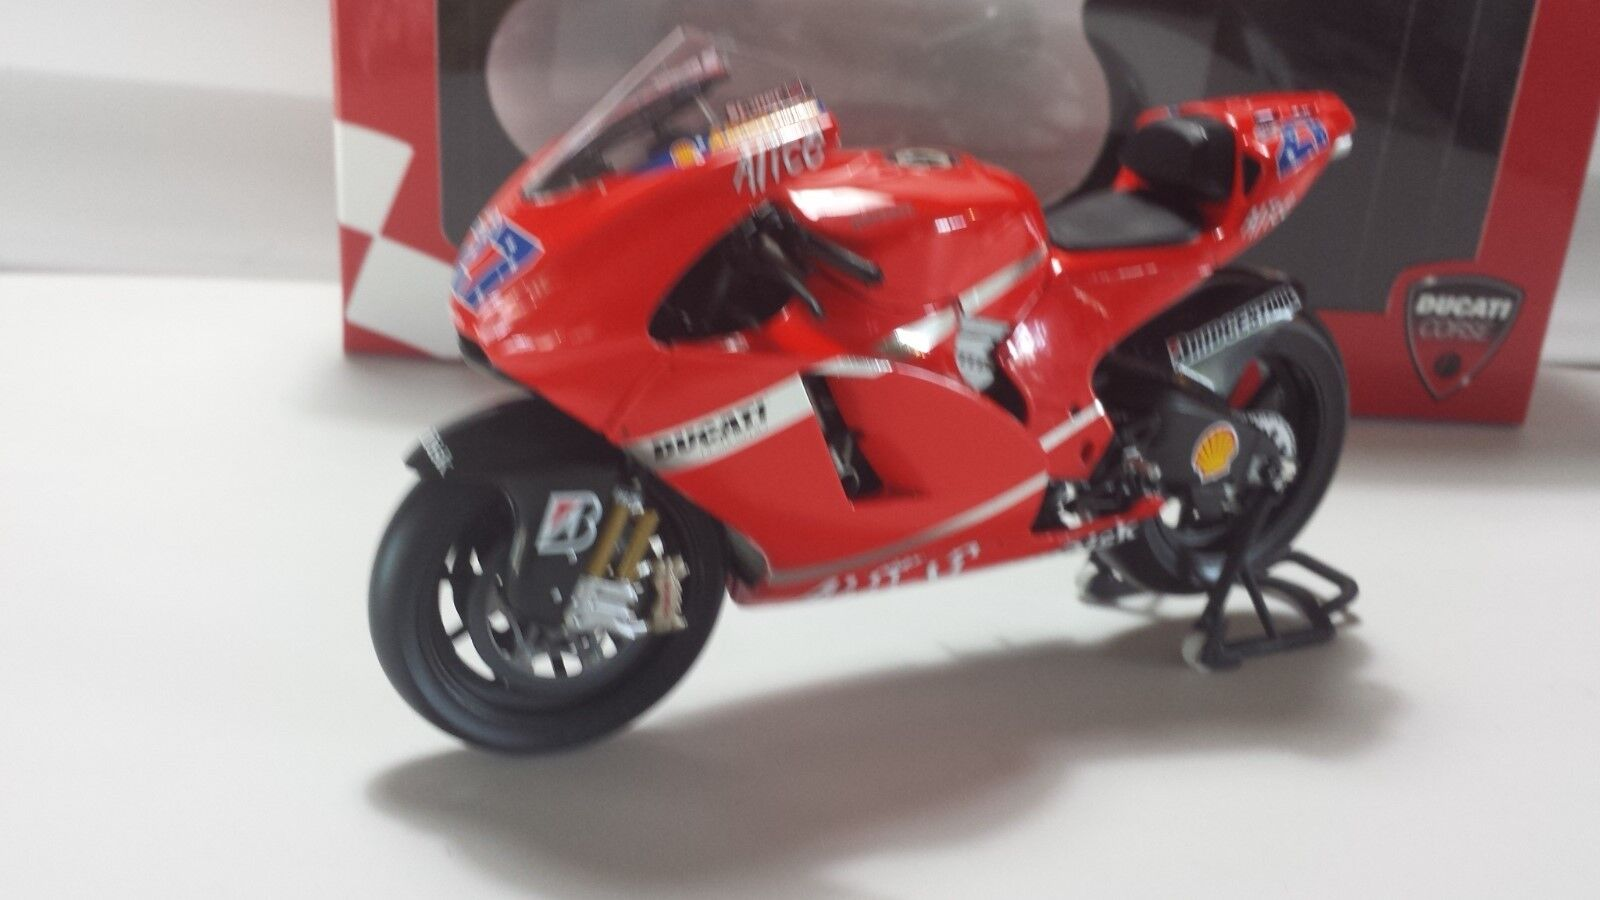 Casey Casey Casey Stoner. Ducati Desmo16 GP7. Desmosedici MotoGP 2007. Minichamps 1 12 a51683